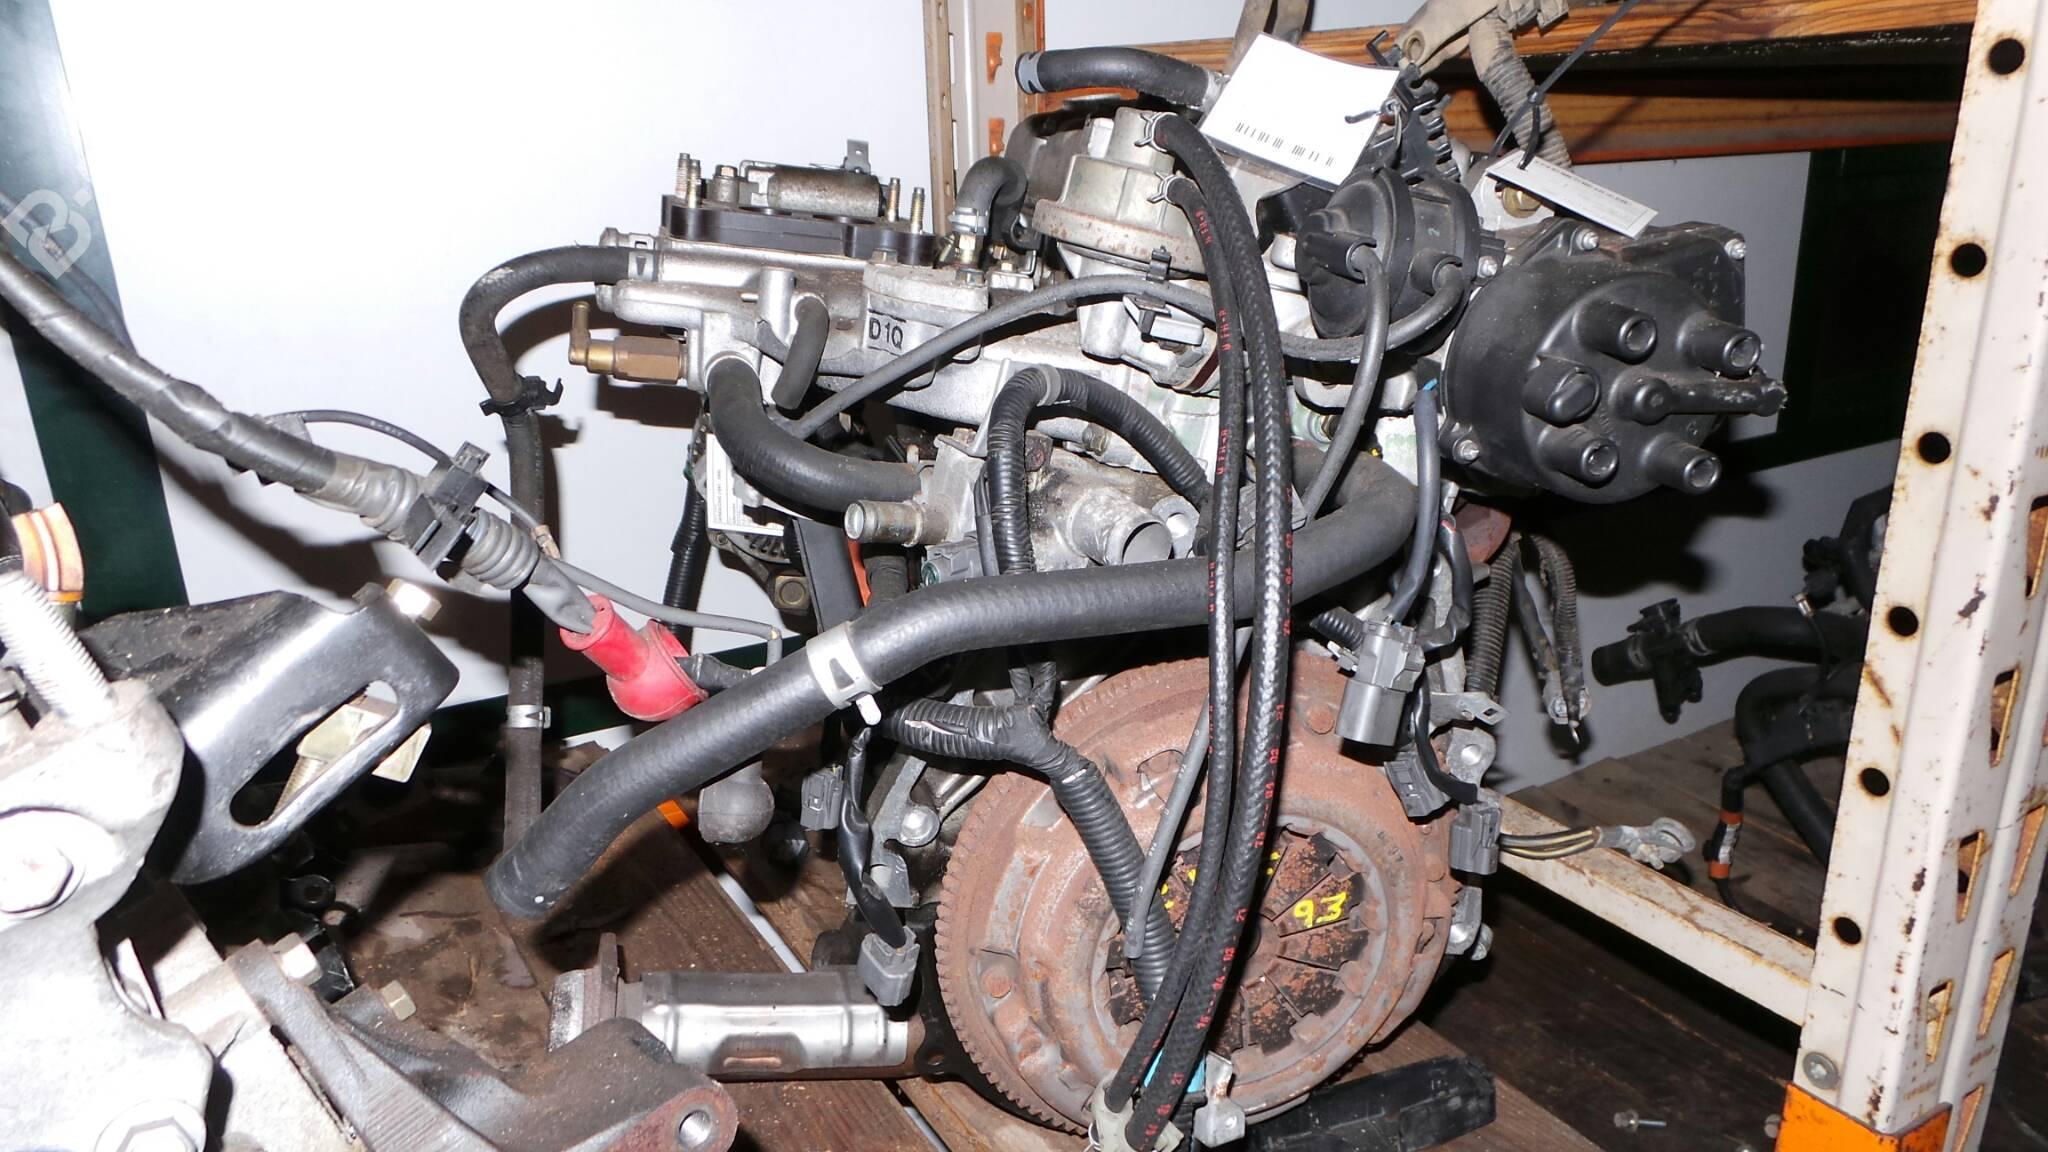 Engine Honda Civic V Hatchback Eg 13 16v Eg3 10408 1992 1993 1994 1995 Fuse Box Complete 75hp